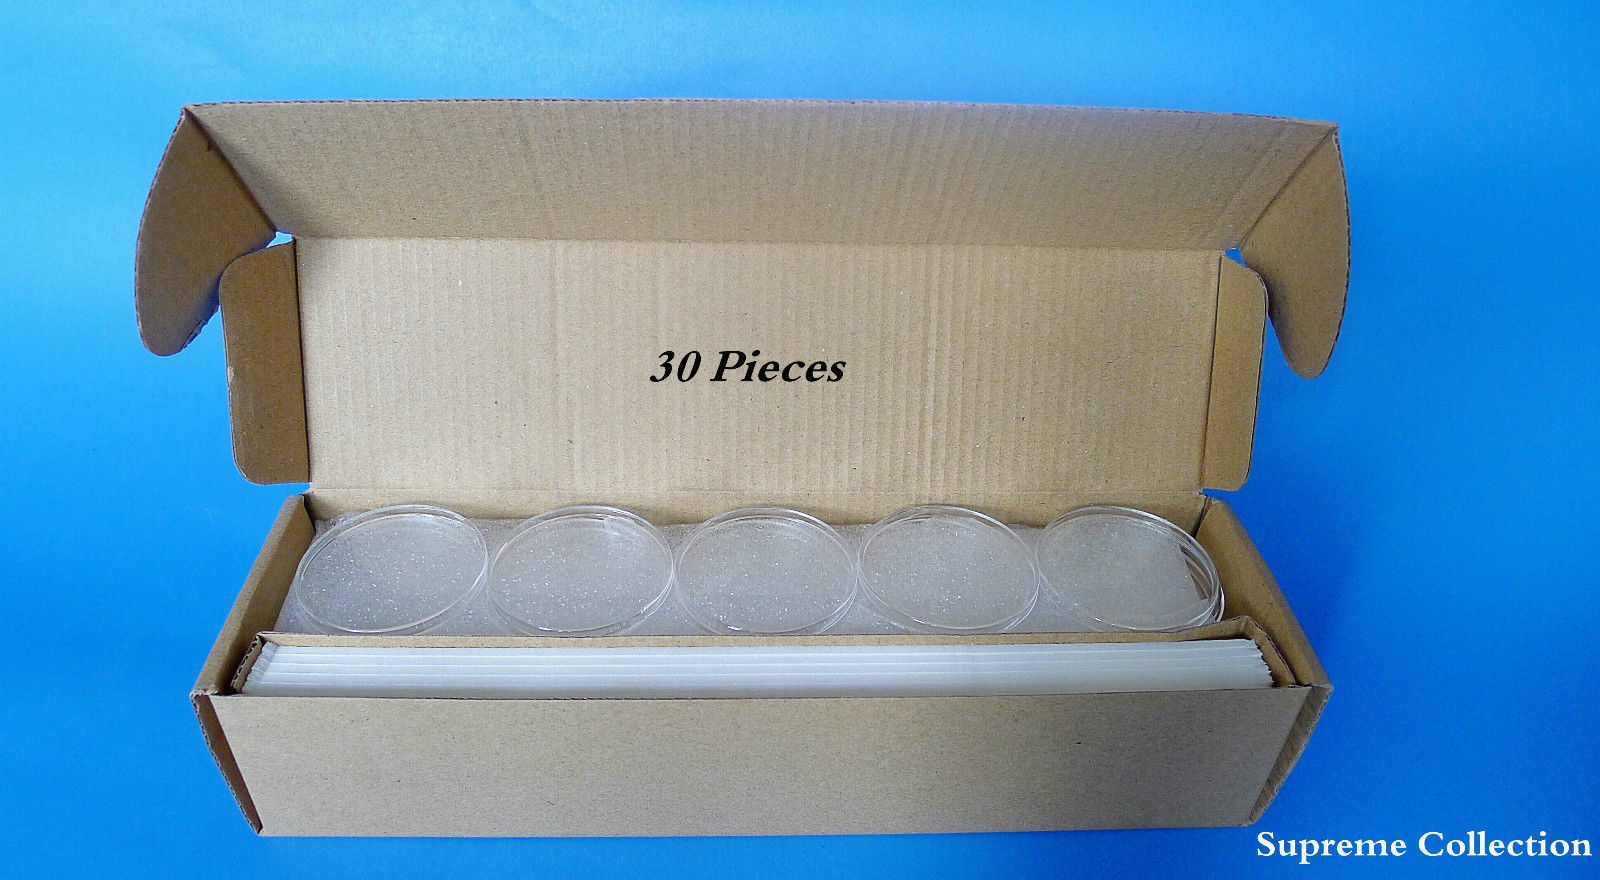 30 Pcs Box Round Shape Air-Tite Coin holder 18 23 28 33 38mm High Quality White